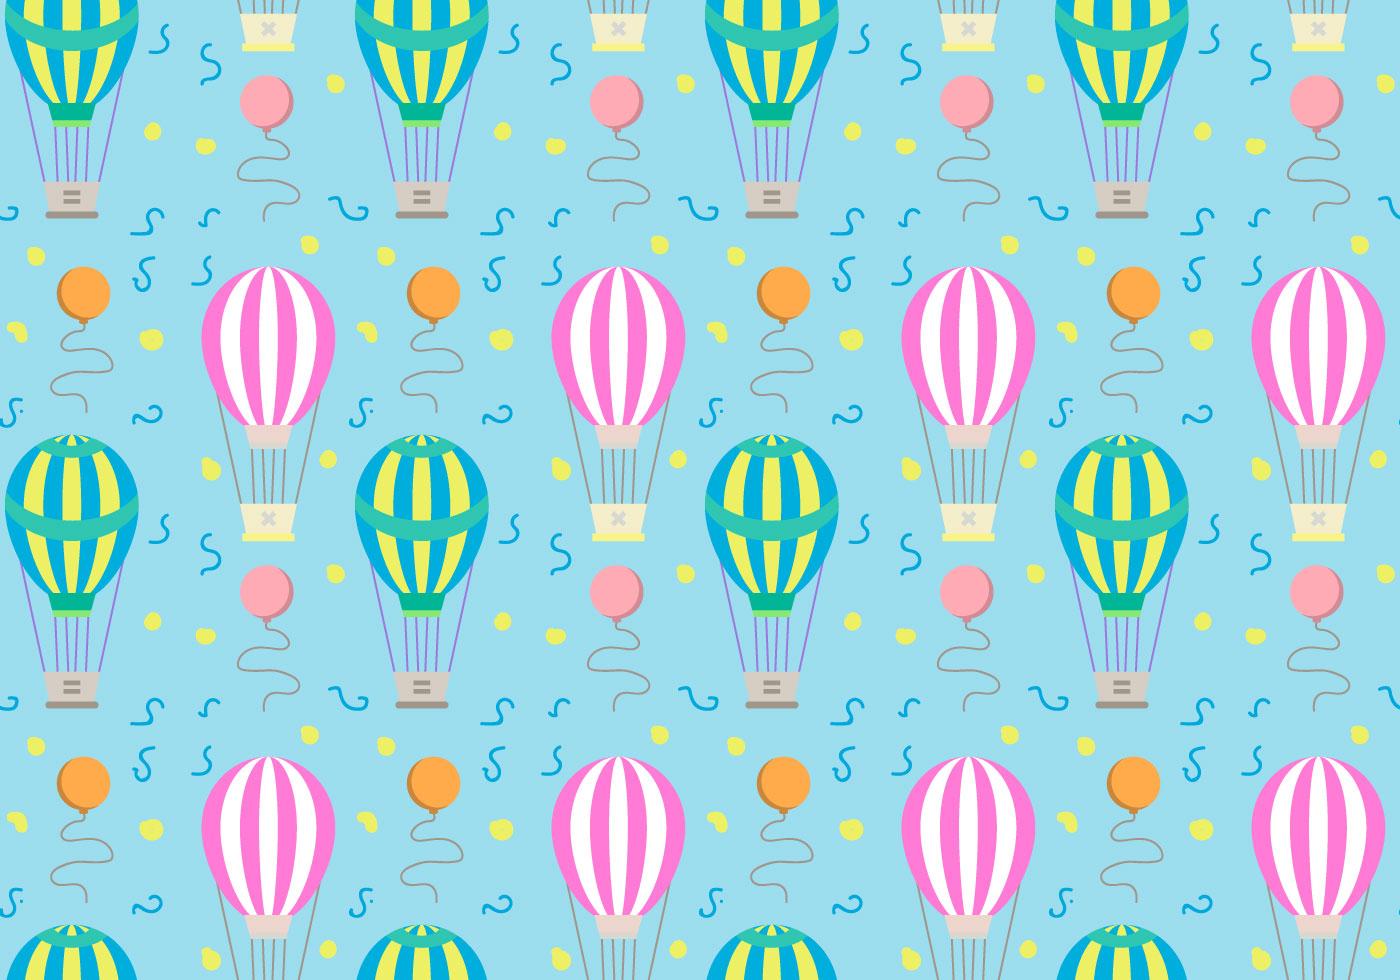 Hot Air Balloons Pattern Vector - Download Free Vectors ...